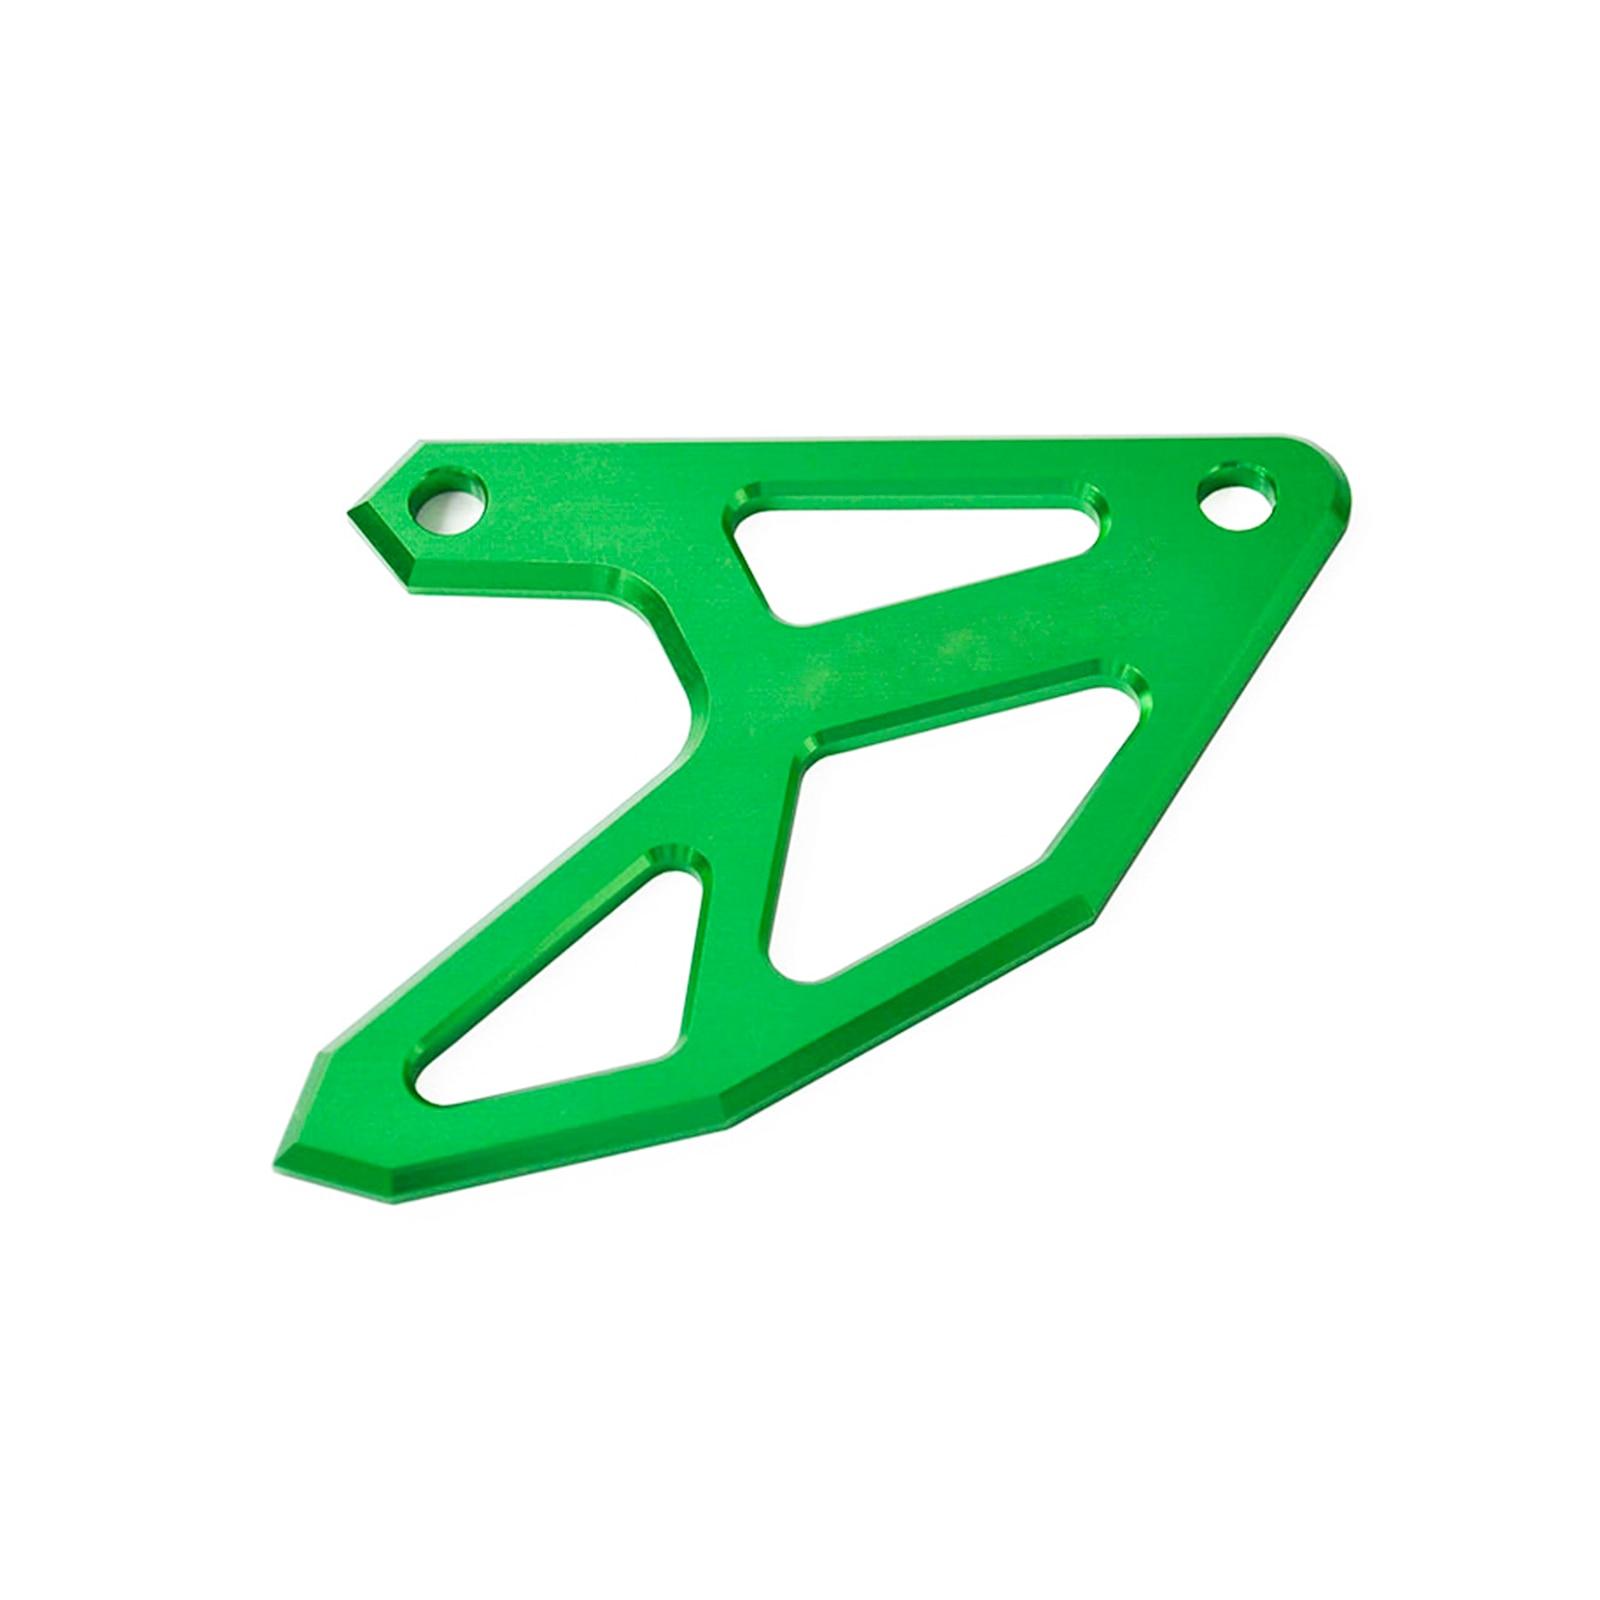 Protector del disco de freno trasero Protector para Kawasaki KX125 KX250 2003-2005 KX250F KX450F 2006-2016 KLX450R 2008-2009 KX 125 de 250